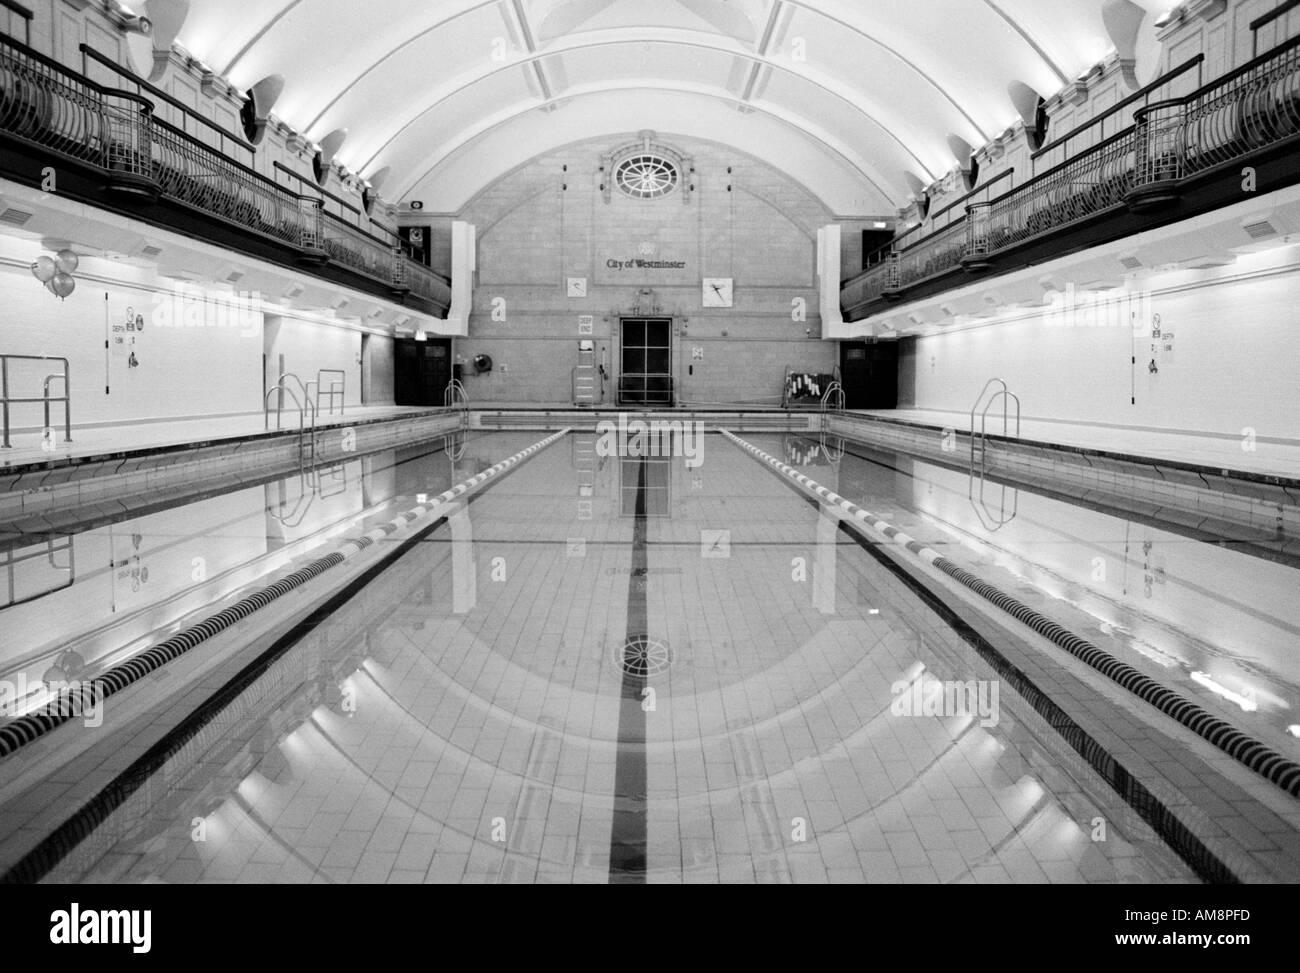 London swimming pool black and white stock photos images - Swimming pool highbury and islington ...